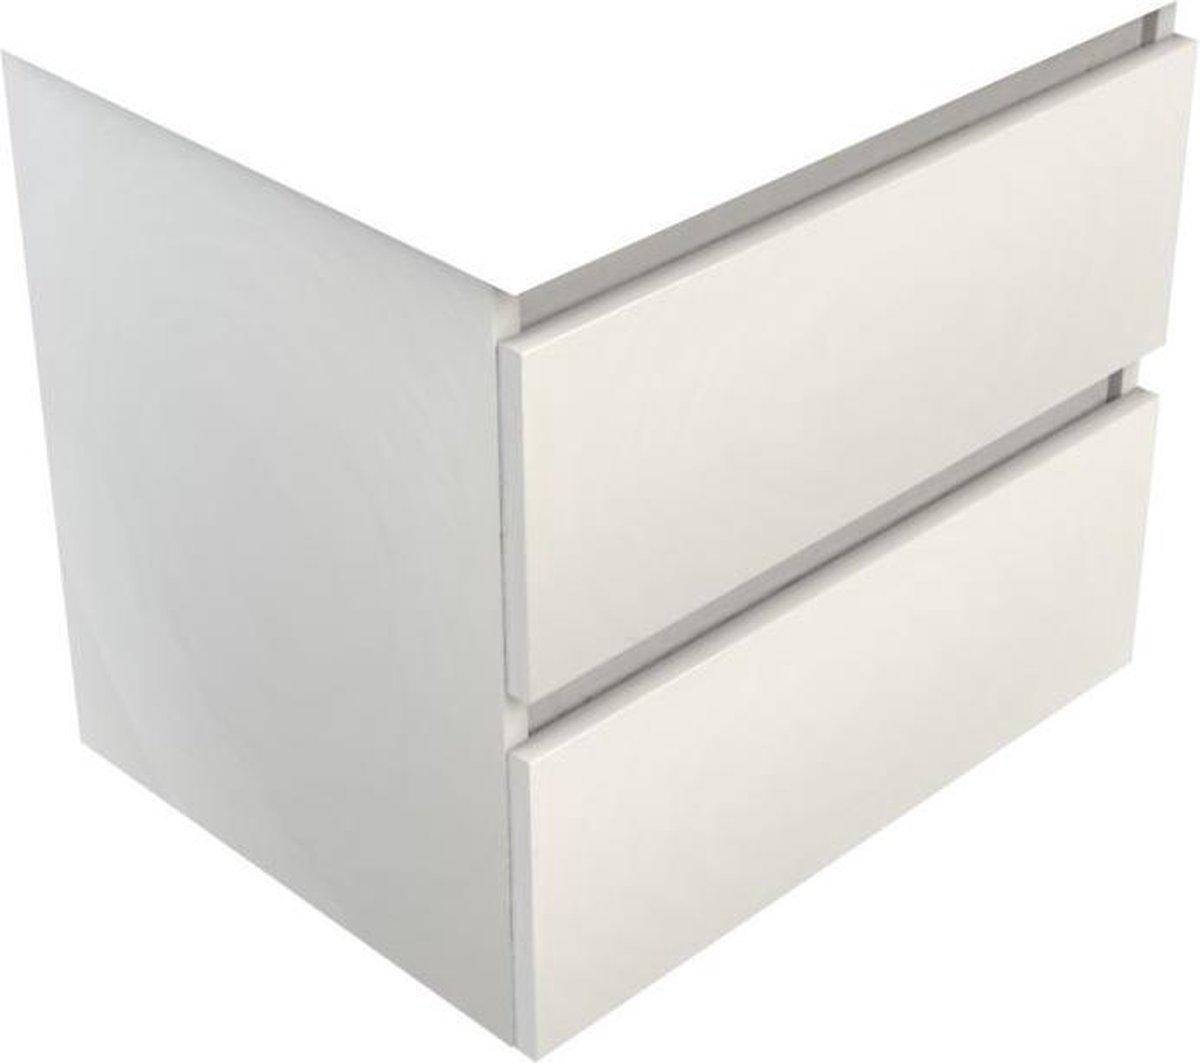 Sub 120 wastafelonderkast 100x46 cm met 2 laden, wit gelakt